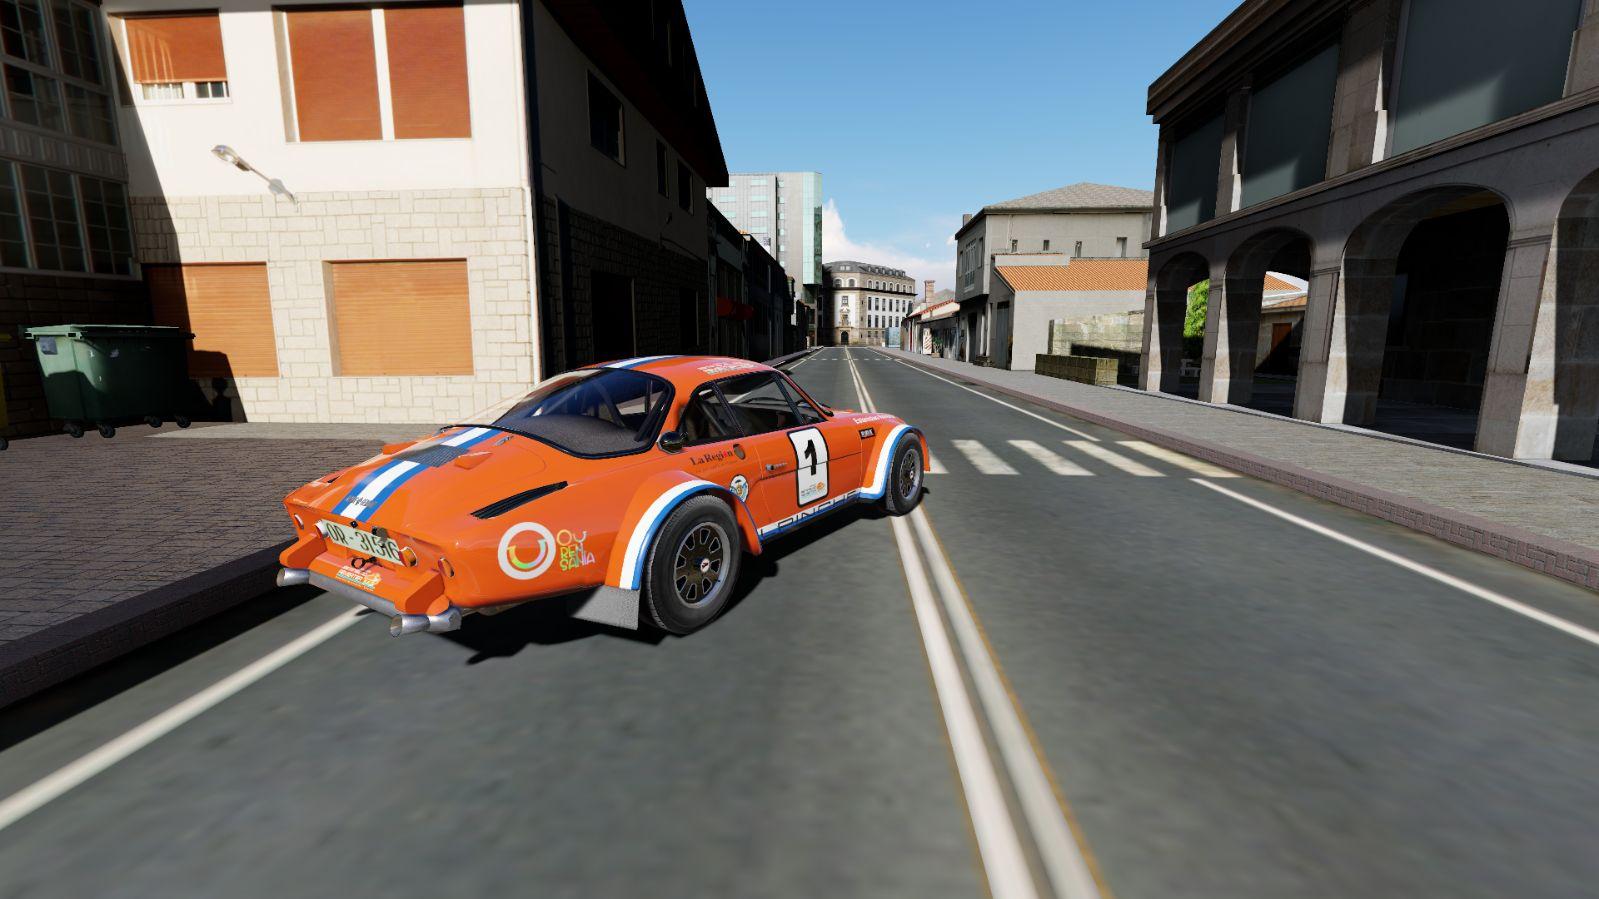 Alpinche_VR 1